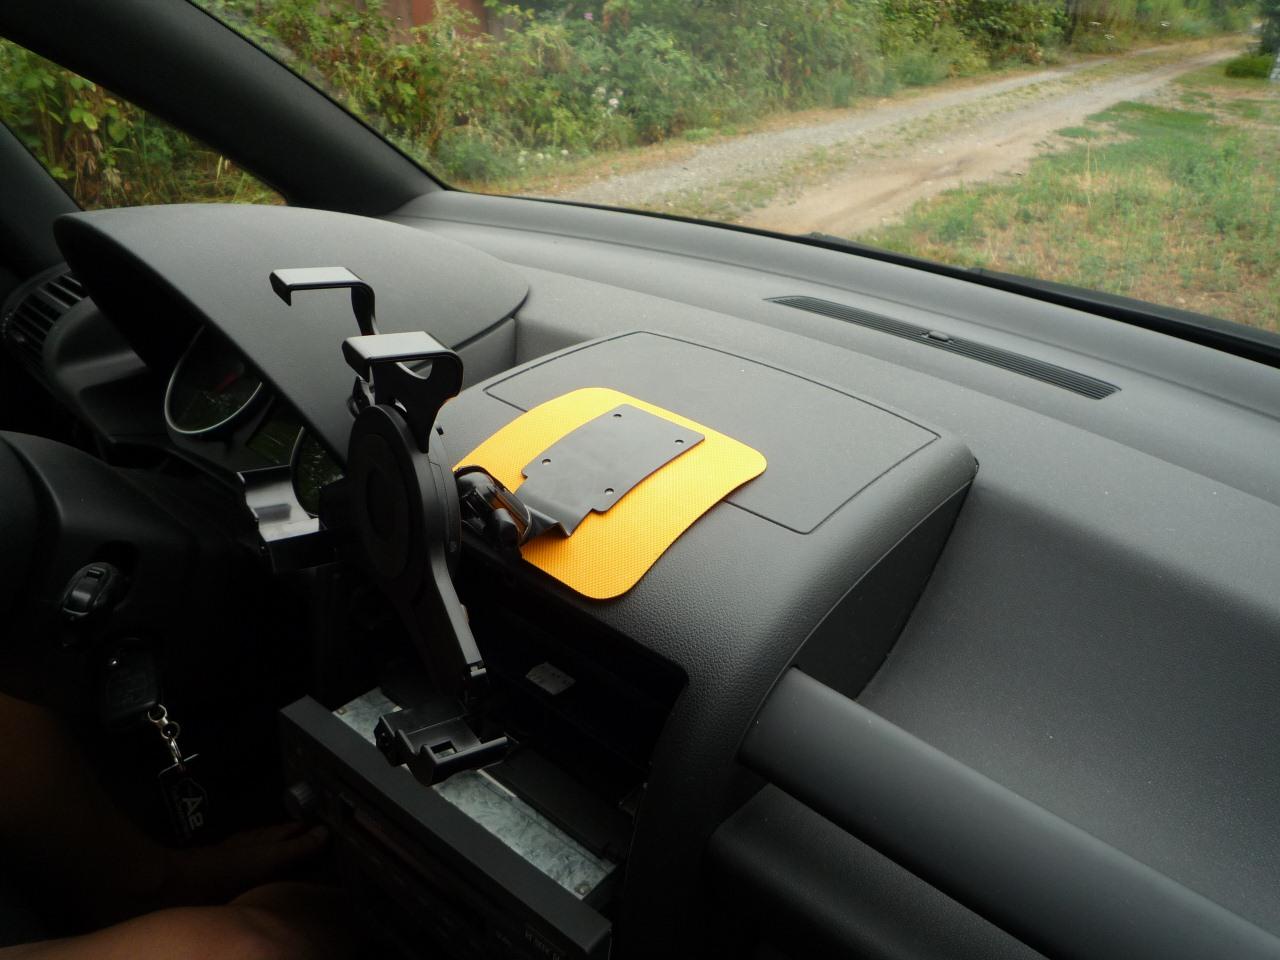 CAR-UMPC-Projekt_Haltertest1.JPG.099ca8cb693eaa4ebec5dff832648e35.JPG